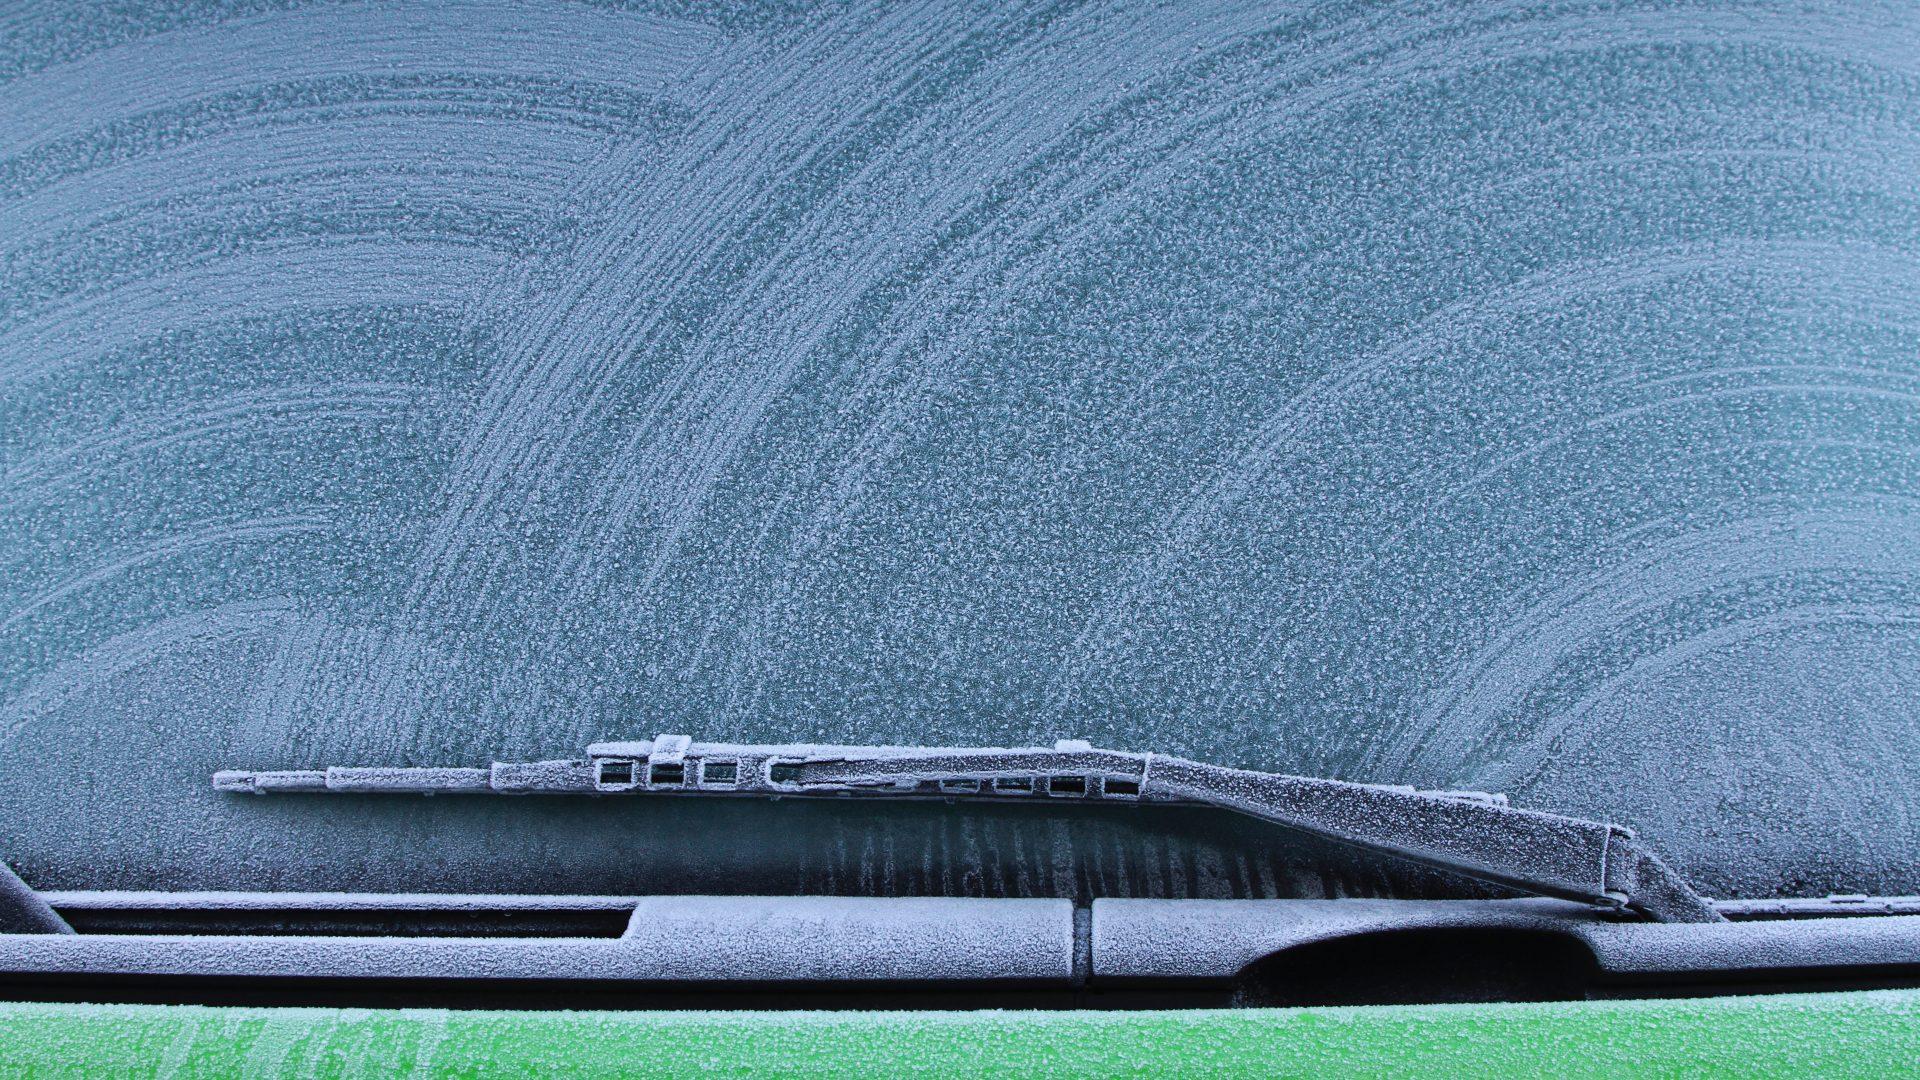 Running Wallpaper Iphone Car Windshield Wallpaper 4k 5k Hd Wallpaper Background